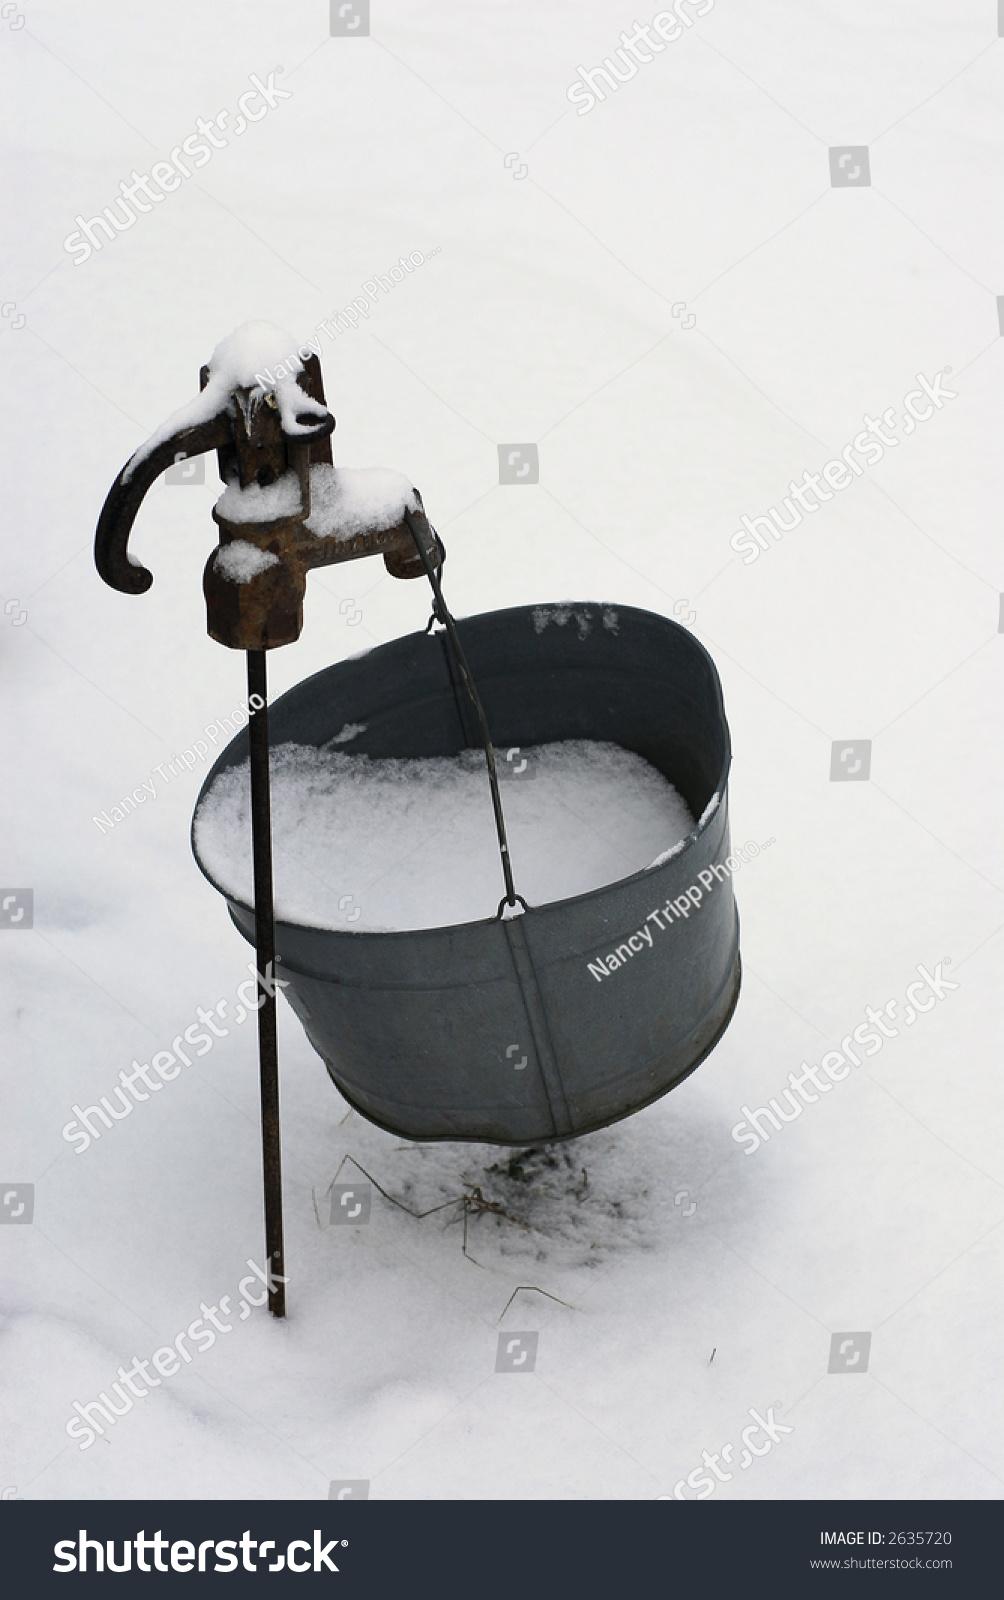 Antique Spigot Bucket Snow Hanging Over Stock Photo 2635720 ...